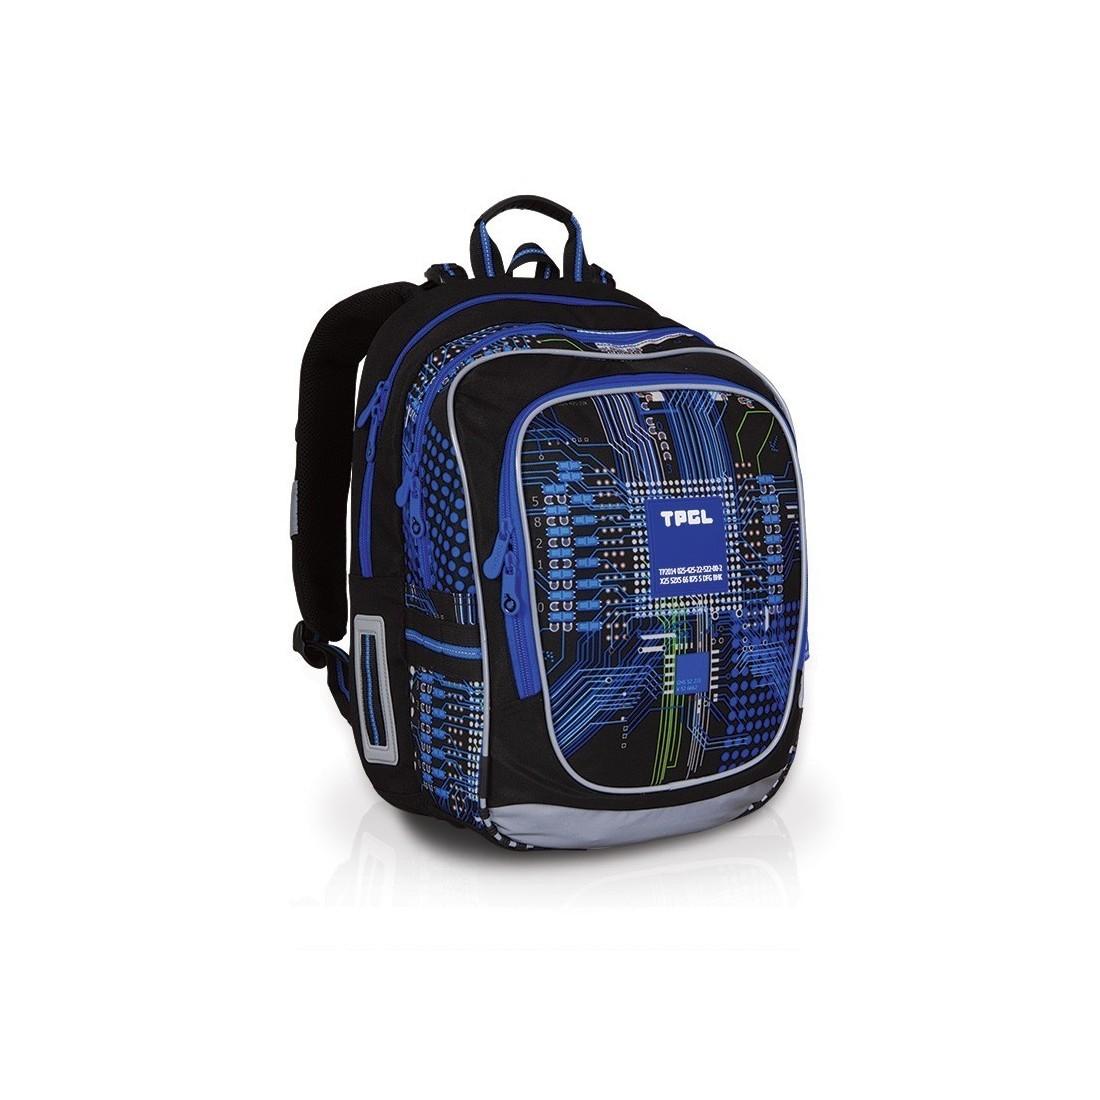 b16115211dd34 Plecak szkolny CHI 742 TOPGAL - plecak-tornister.pl